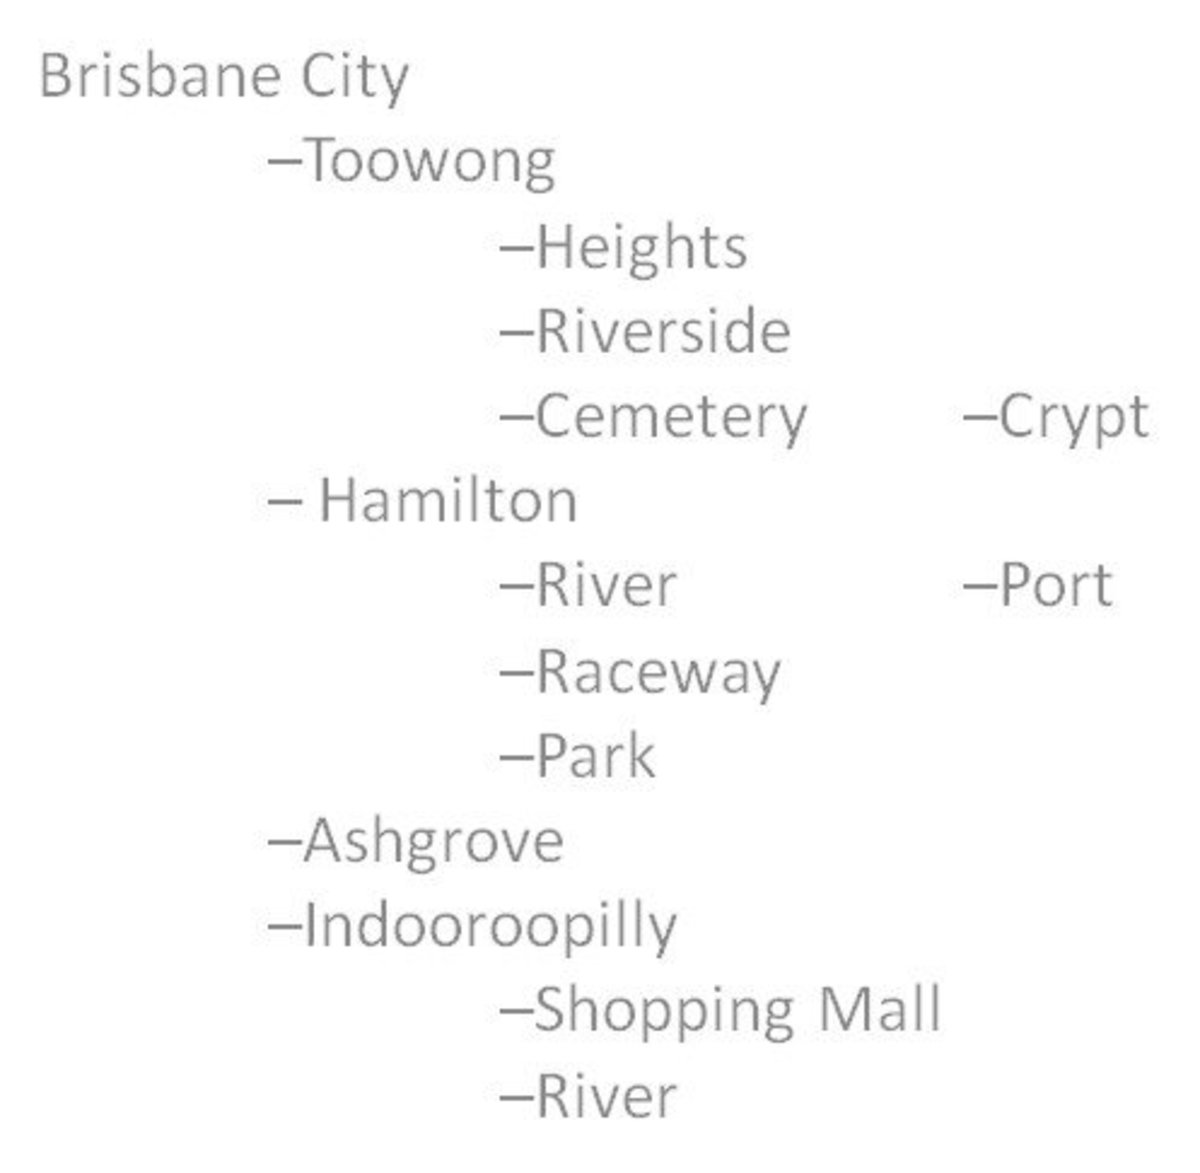 A map diagram for Brisbane City.